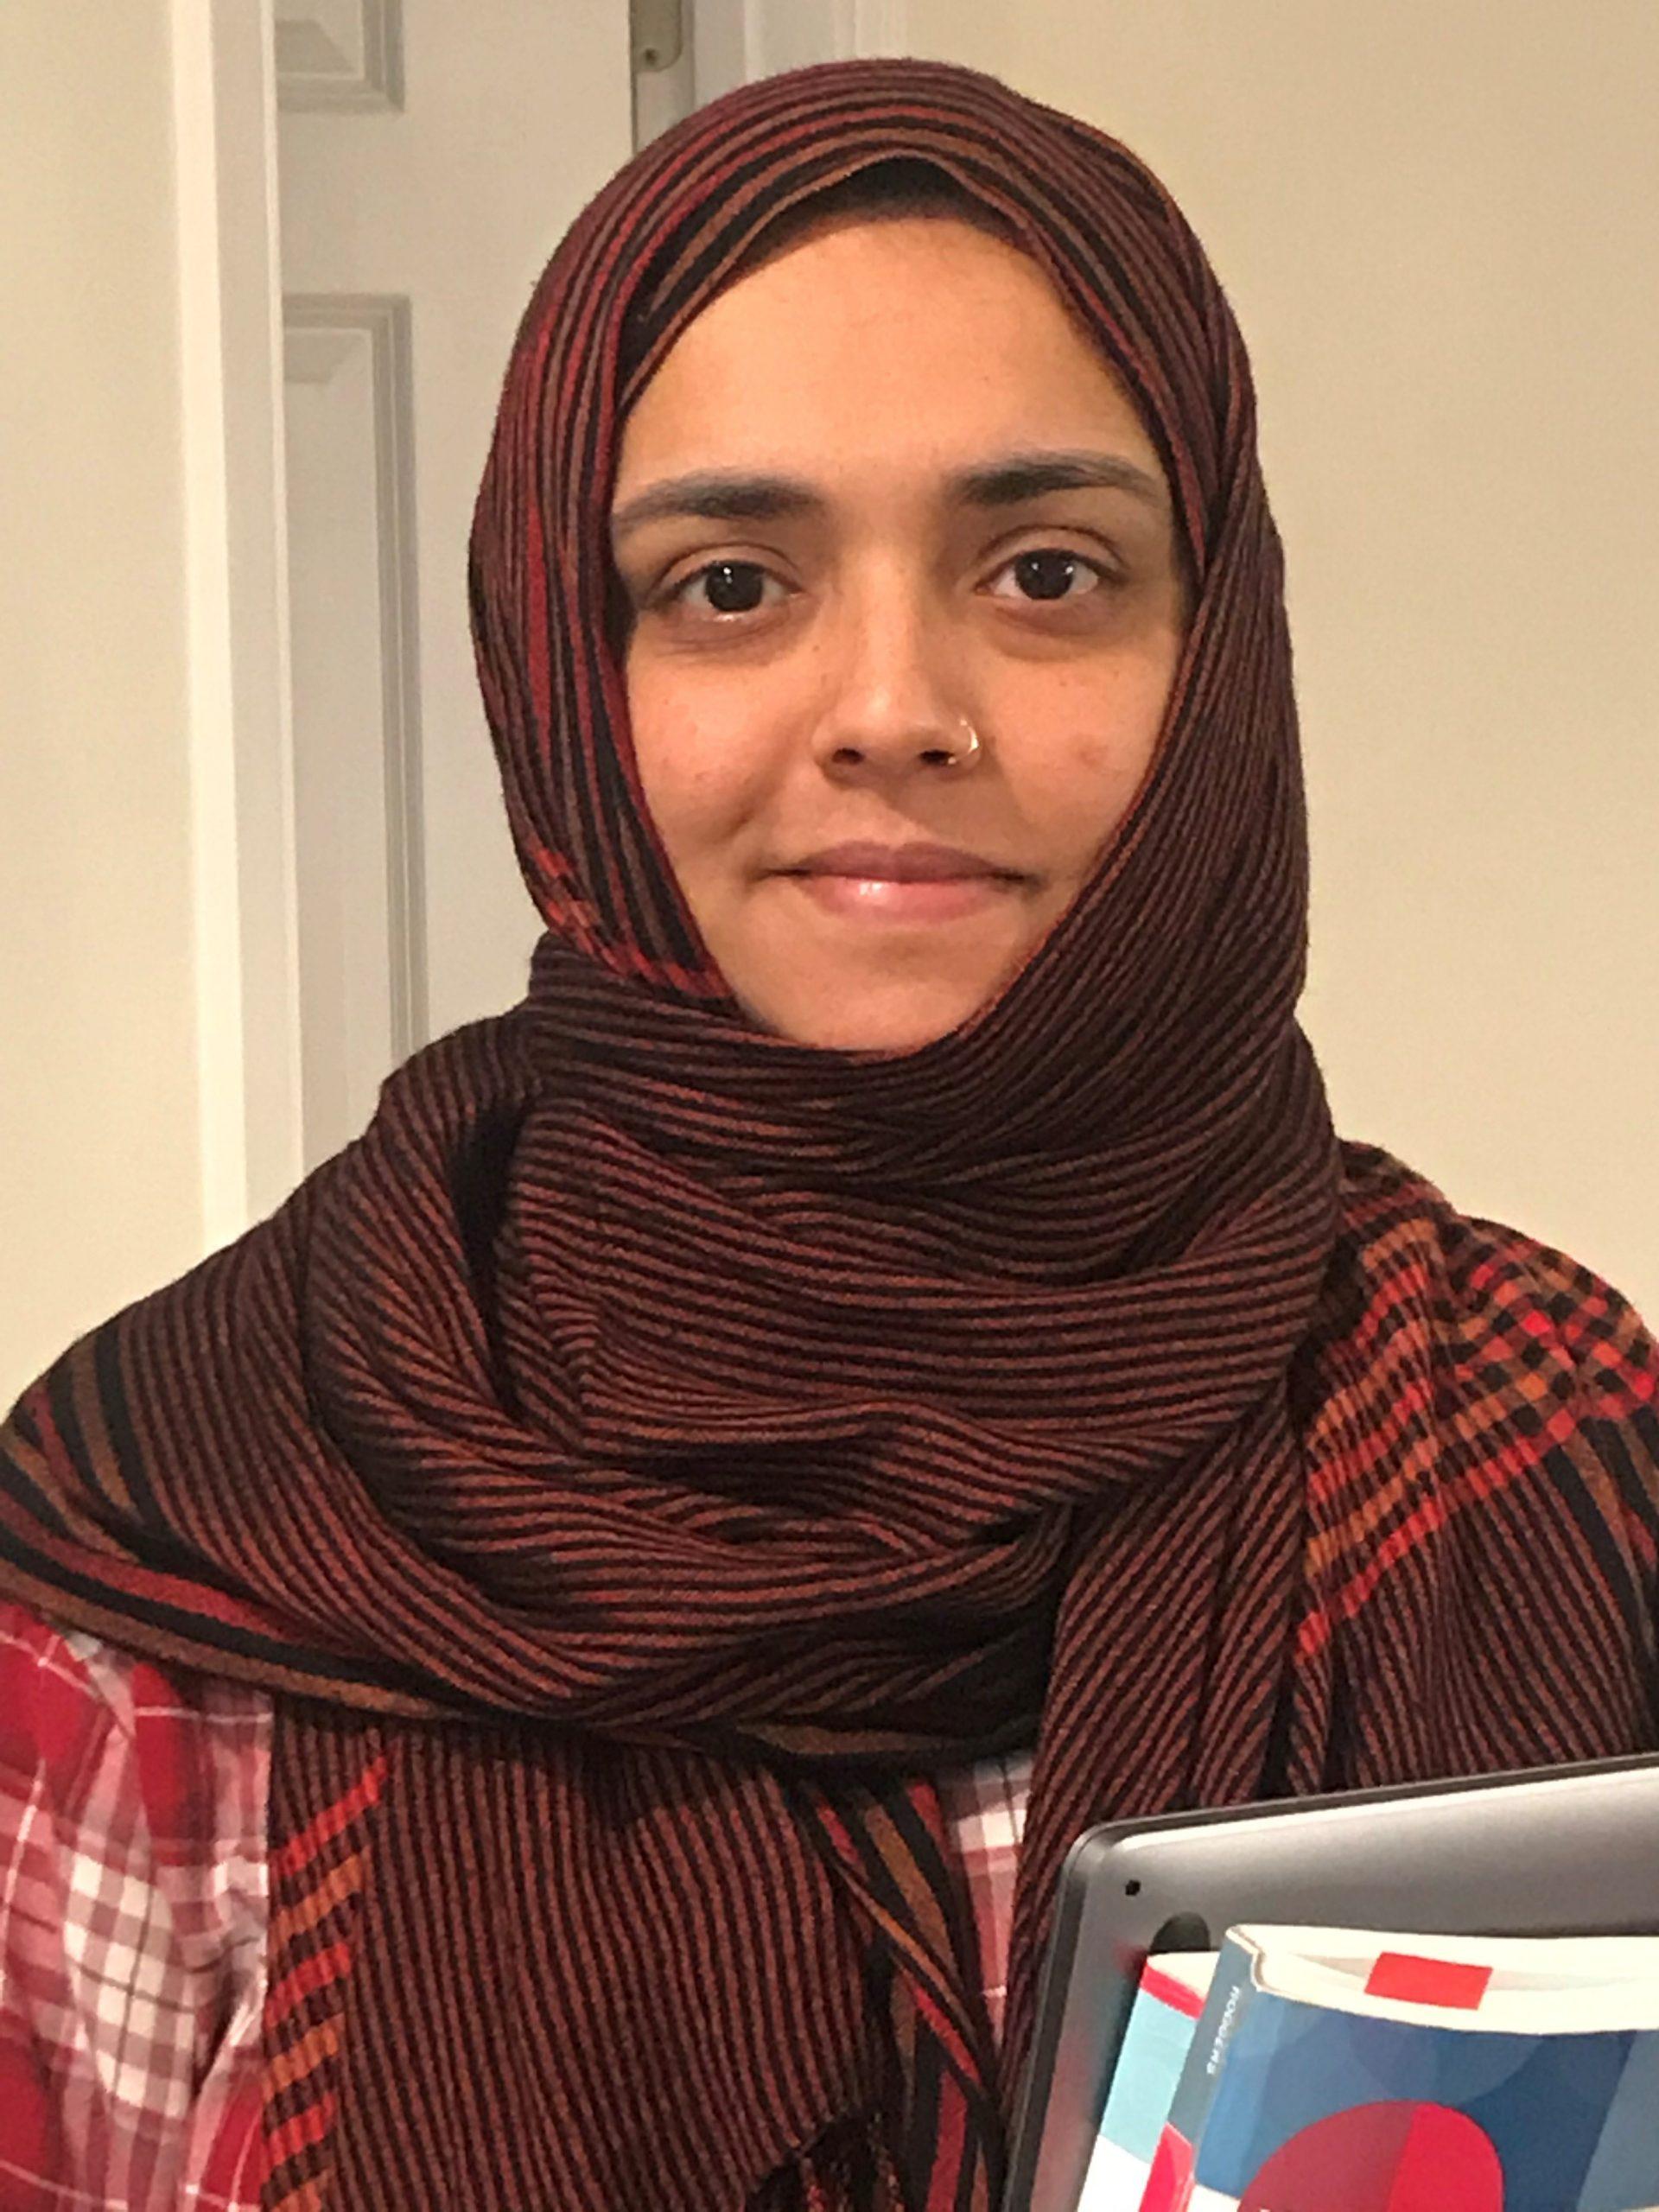 MWCC Student Hafsa Asfa Awarded the Ruth E. Derfler Scholarship